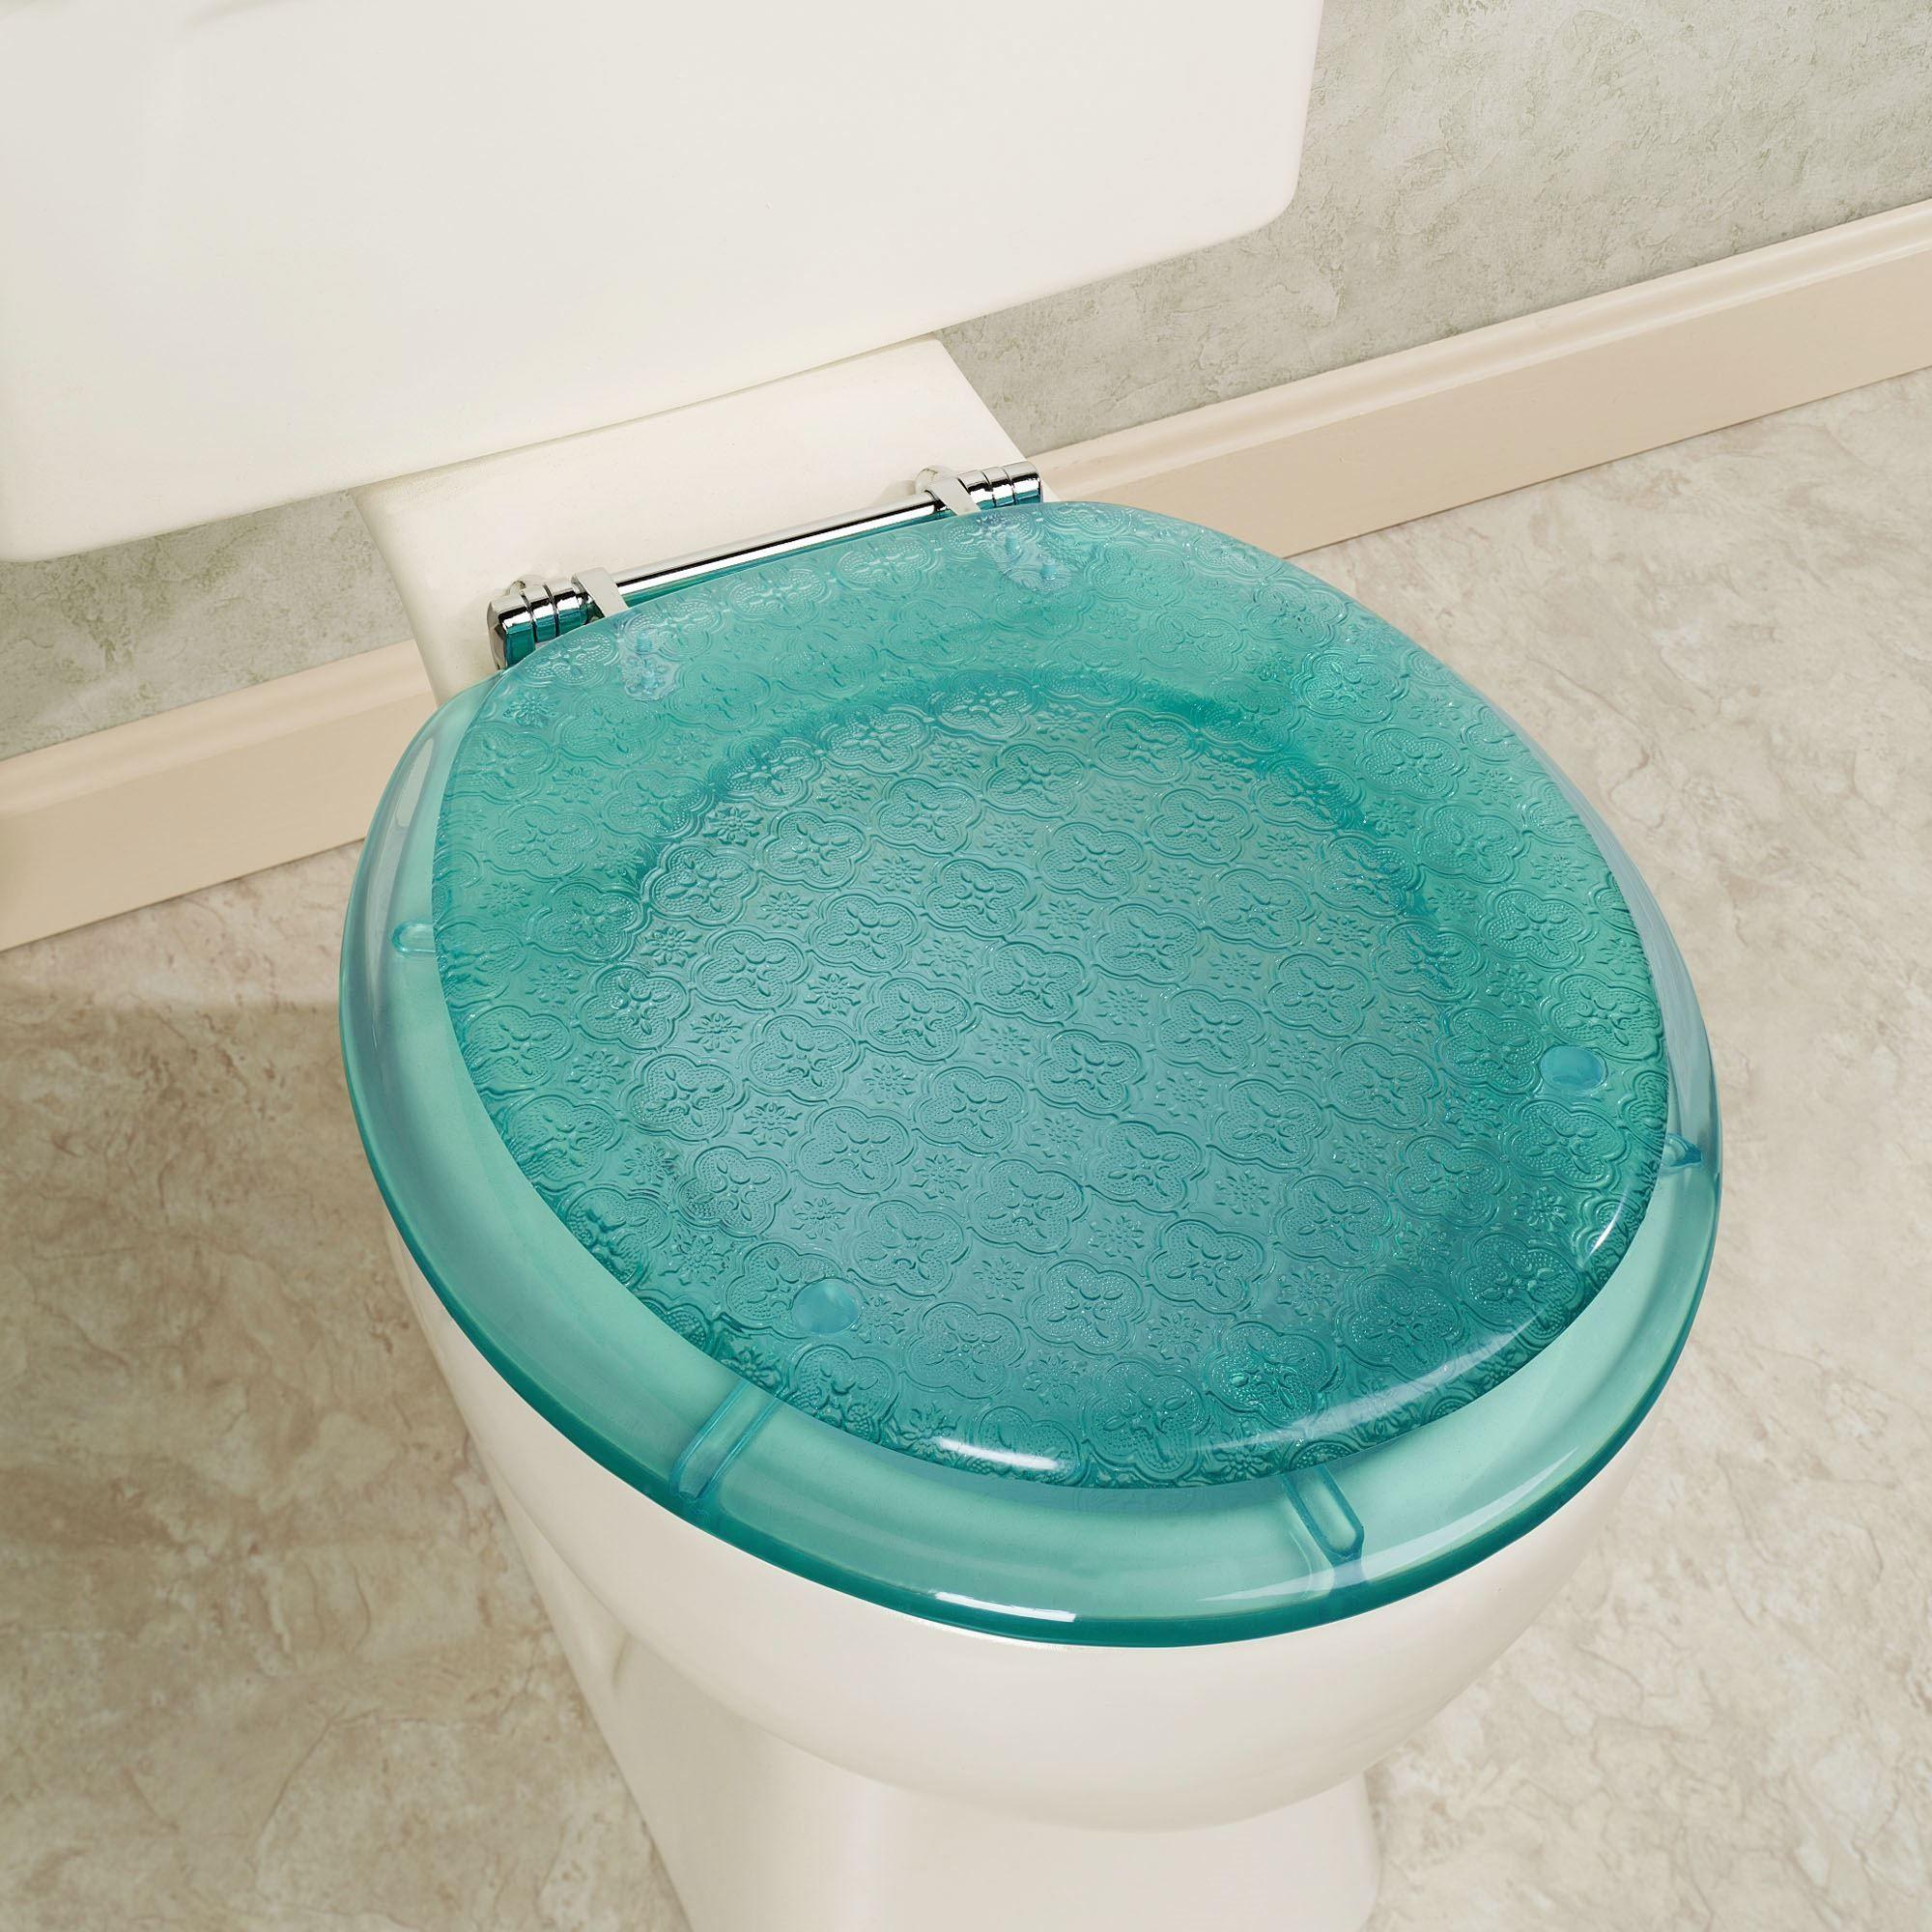 Vesta Teal Decorative Toilet Seat